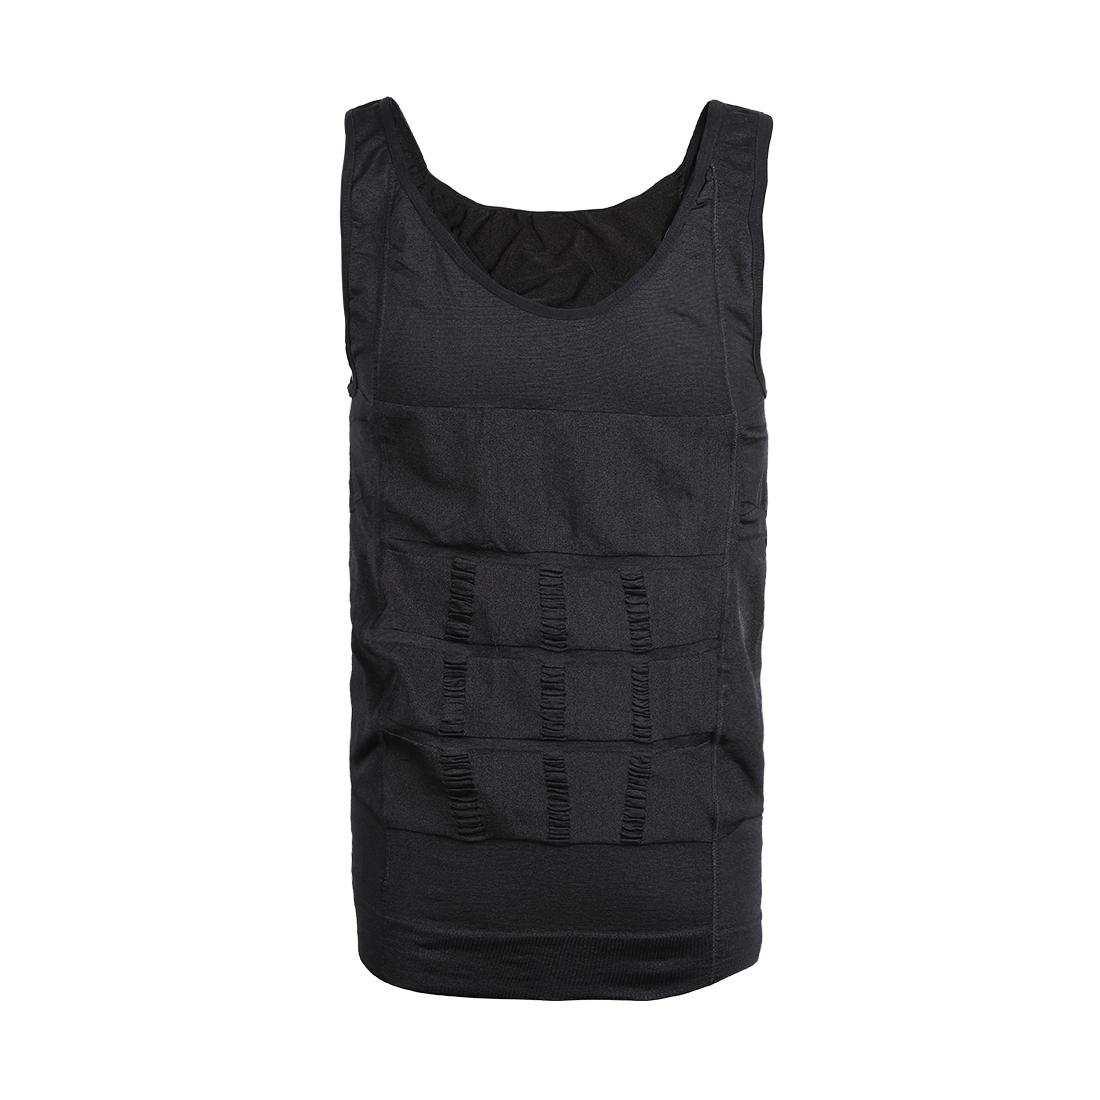 Men Compression Slimming Body Tummy Waist Shapewear Tank Top Black Medium